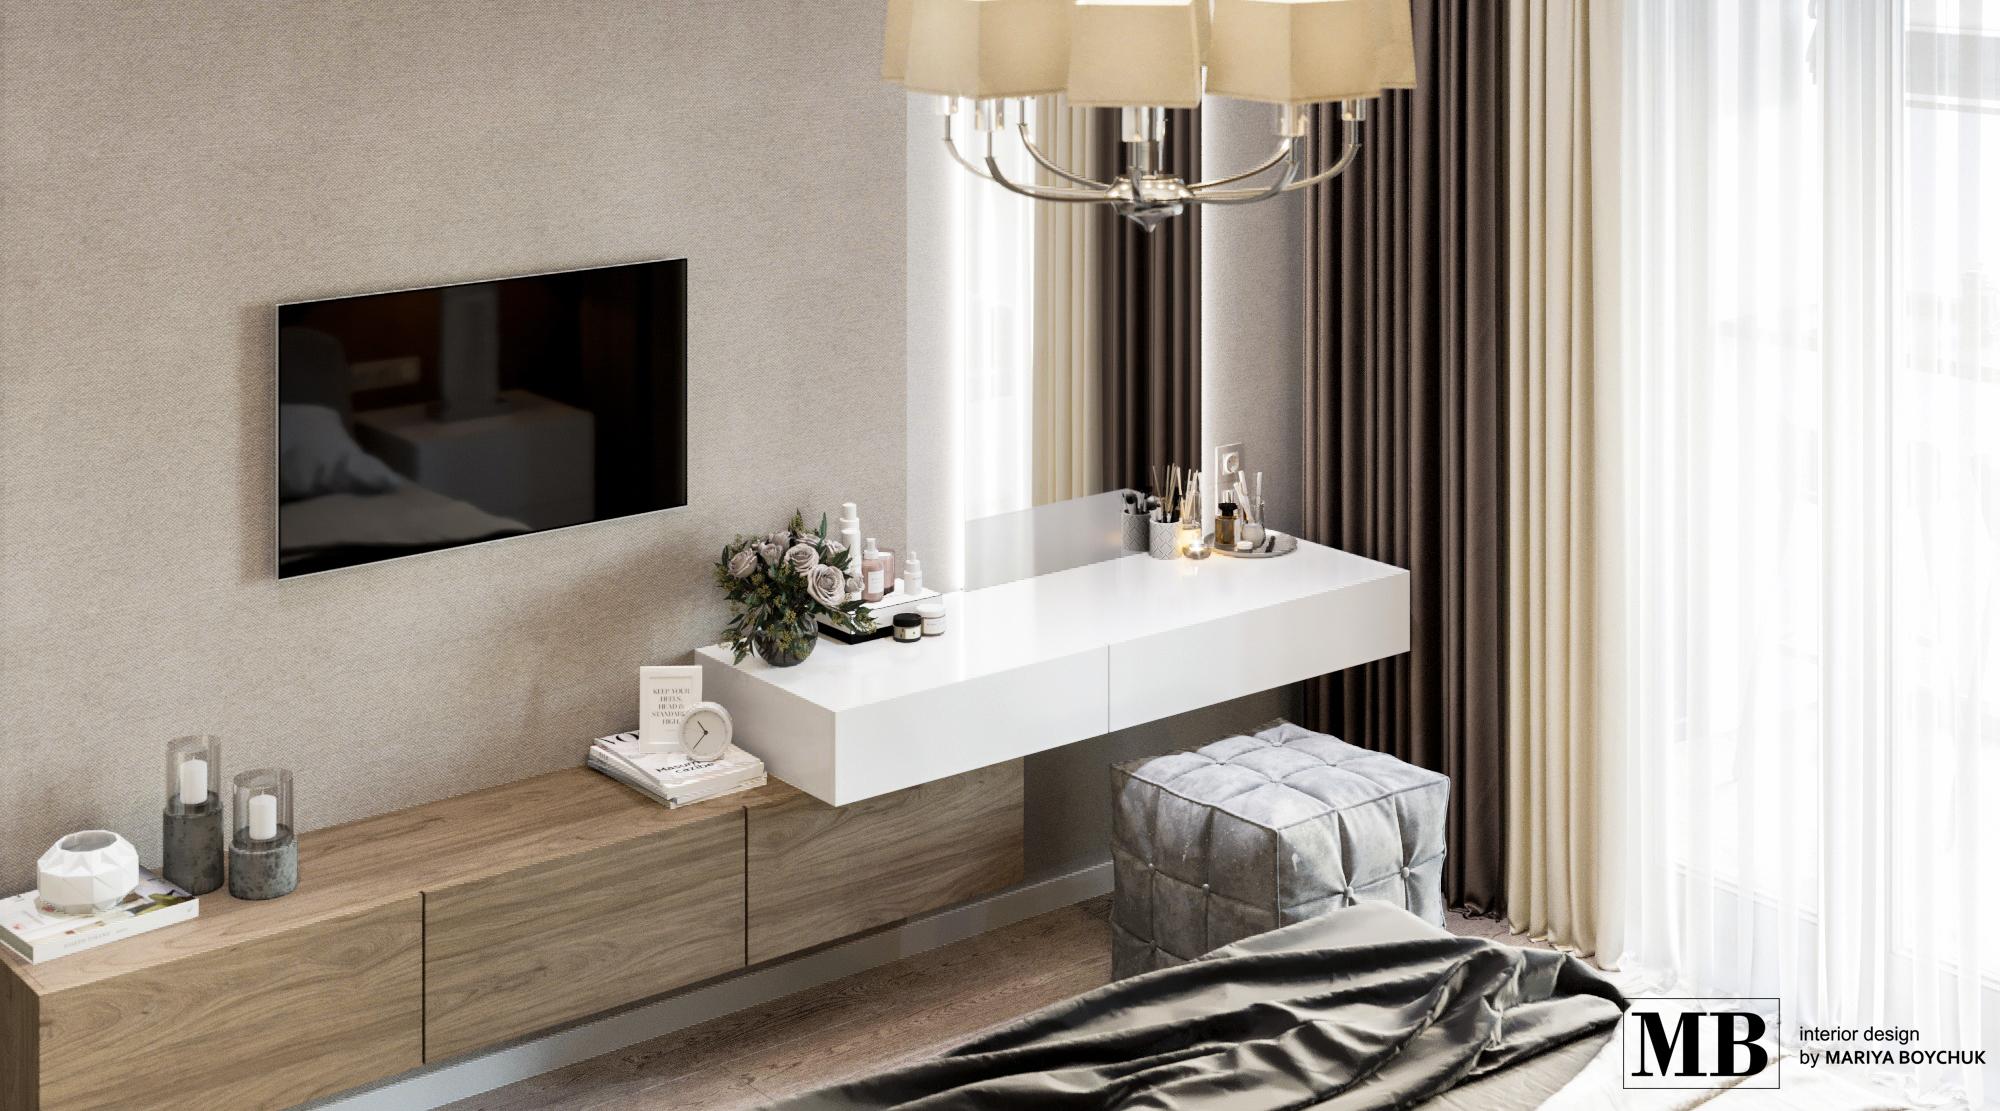 дизайн с элементами лофт стиля в квартире Калининград